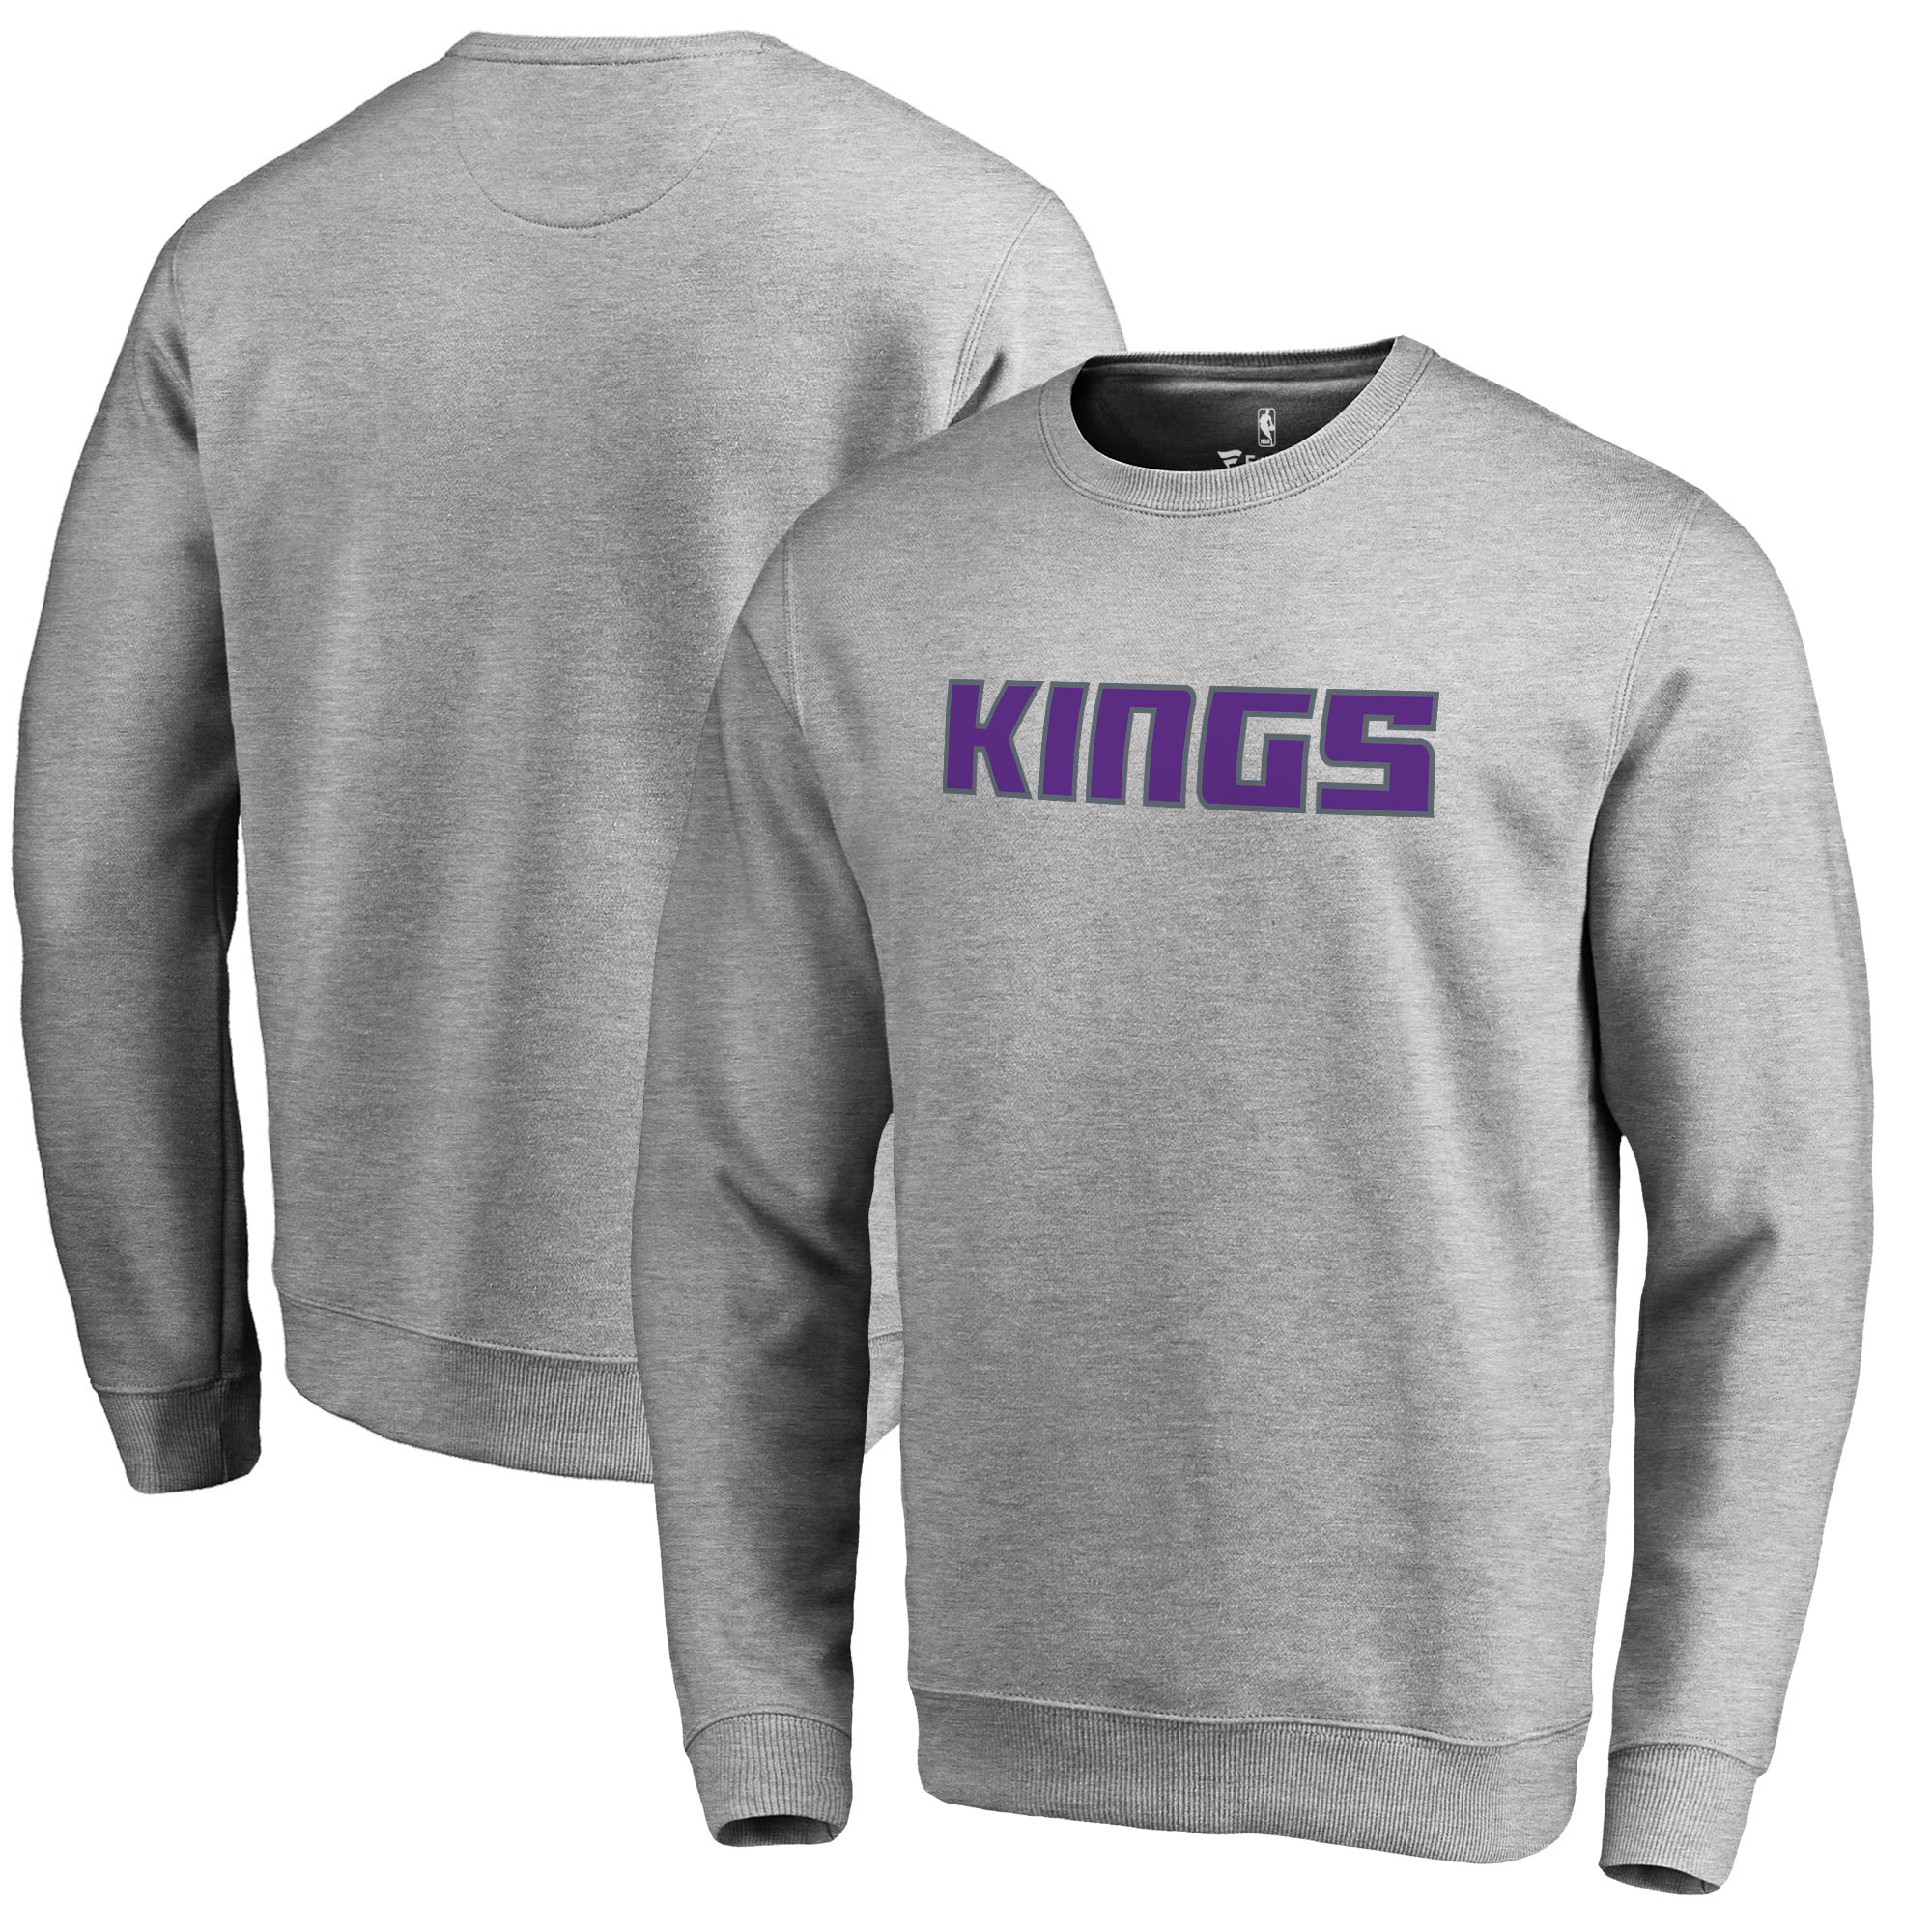 Sacramento Kings Fanatics Branded Wordmark Pullover Sweatshirt - Heathered Gray